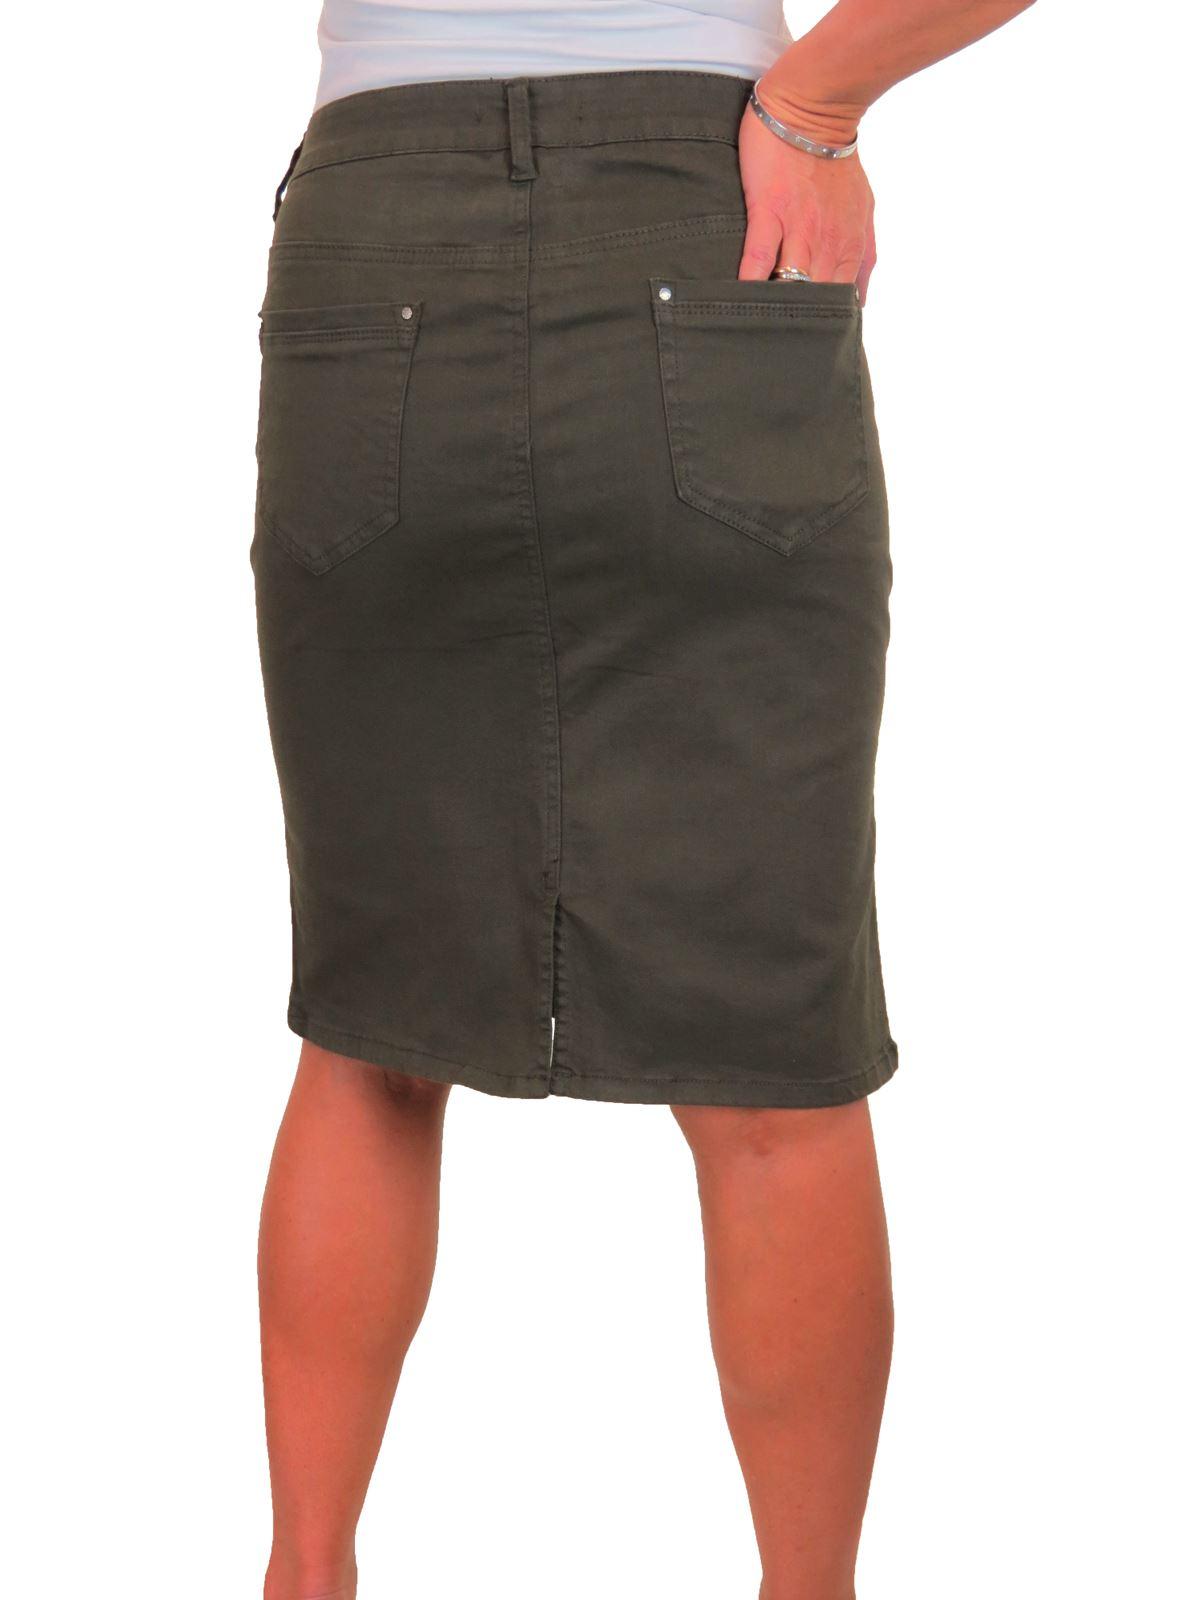 ICE-Womens-Good-Stretch-Jeans-Skirt-Knee-Length-14-22 thumbnail 12